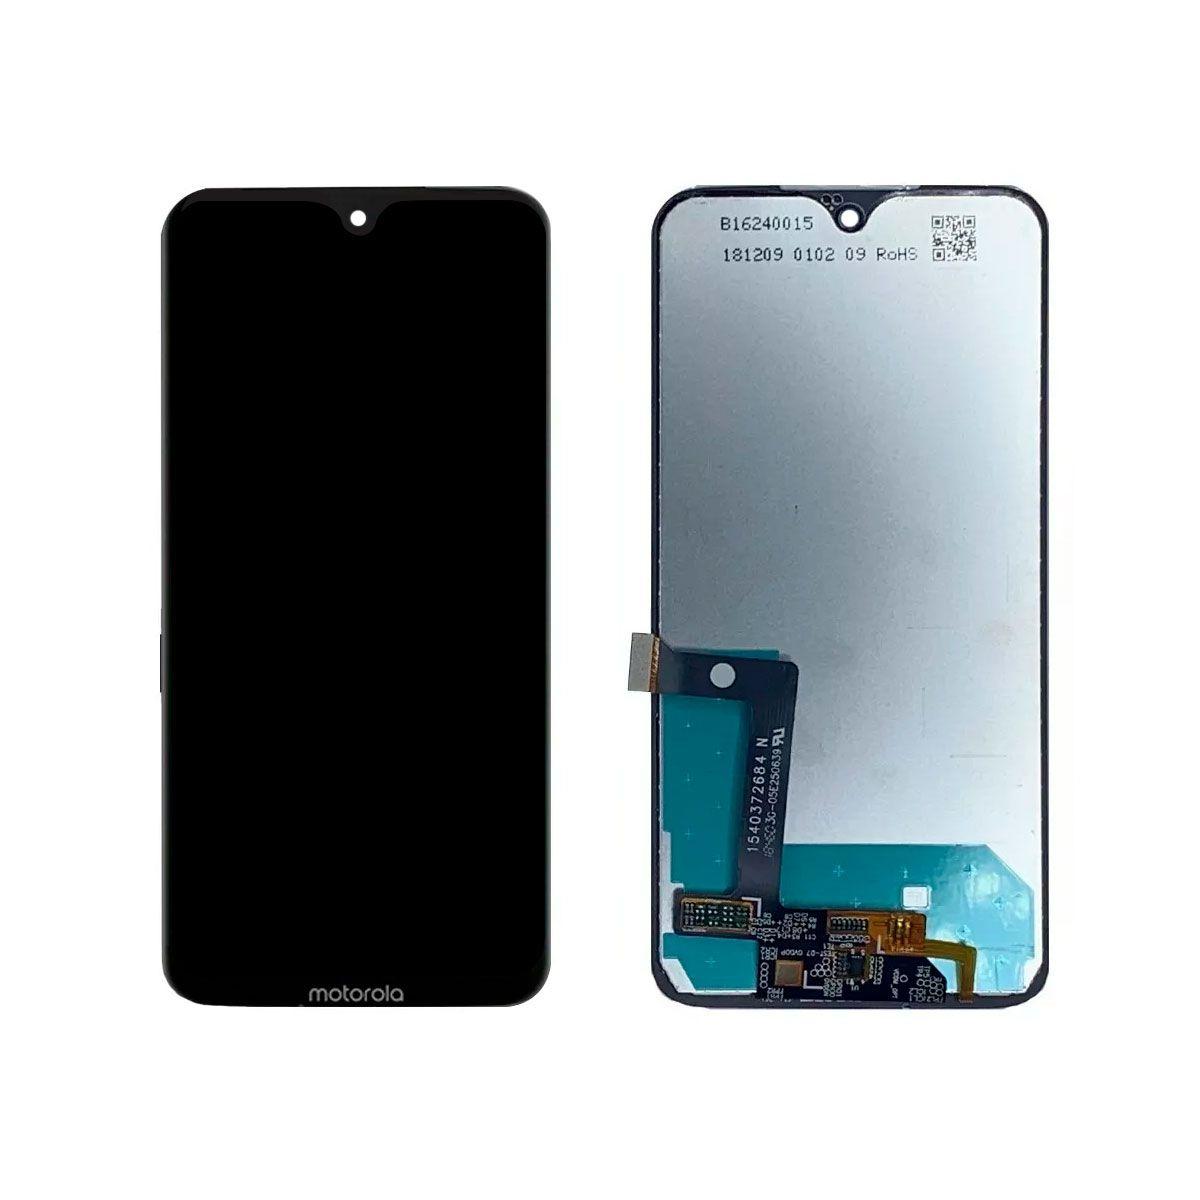 Tela Touch Lcd Display Motorola Moto G7 Plus Original